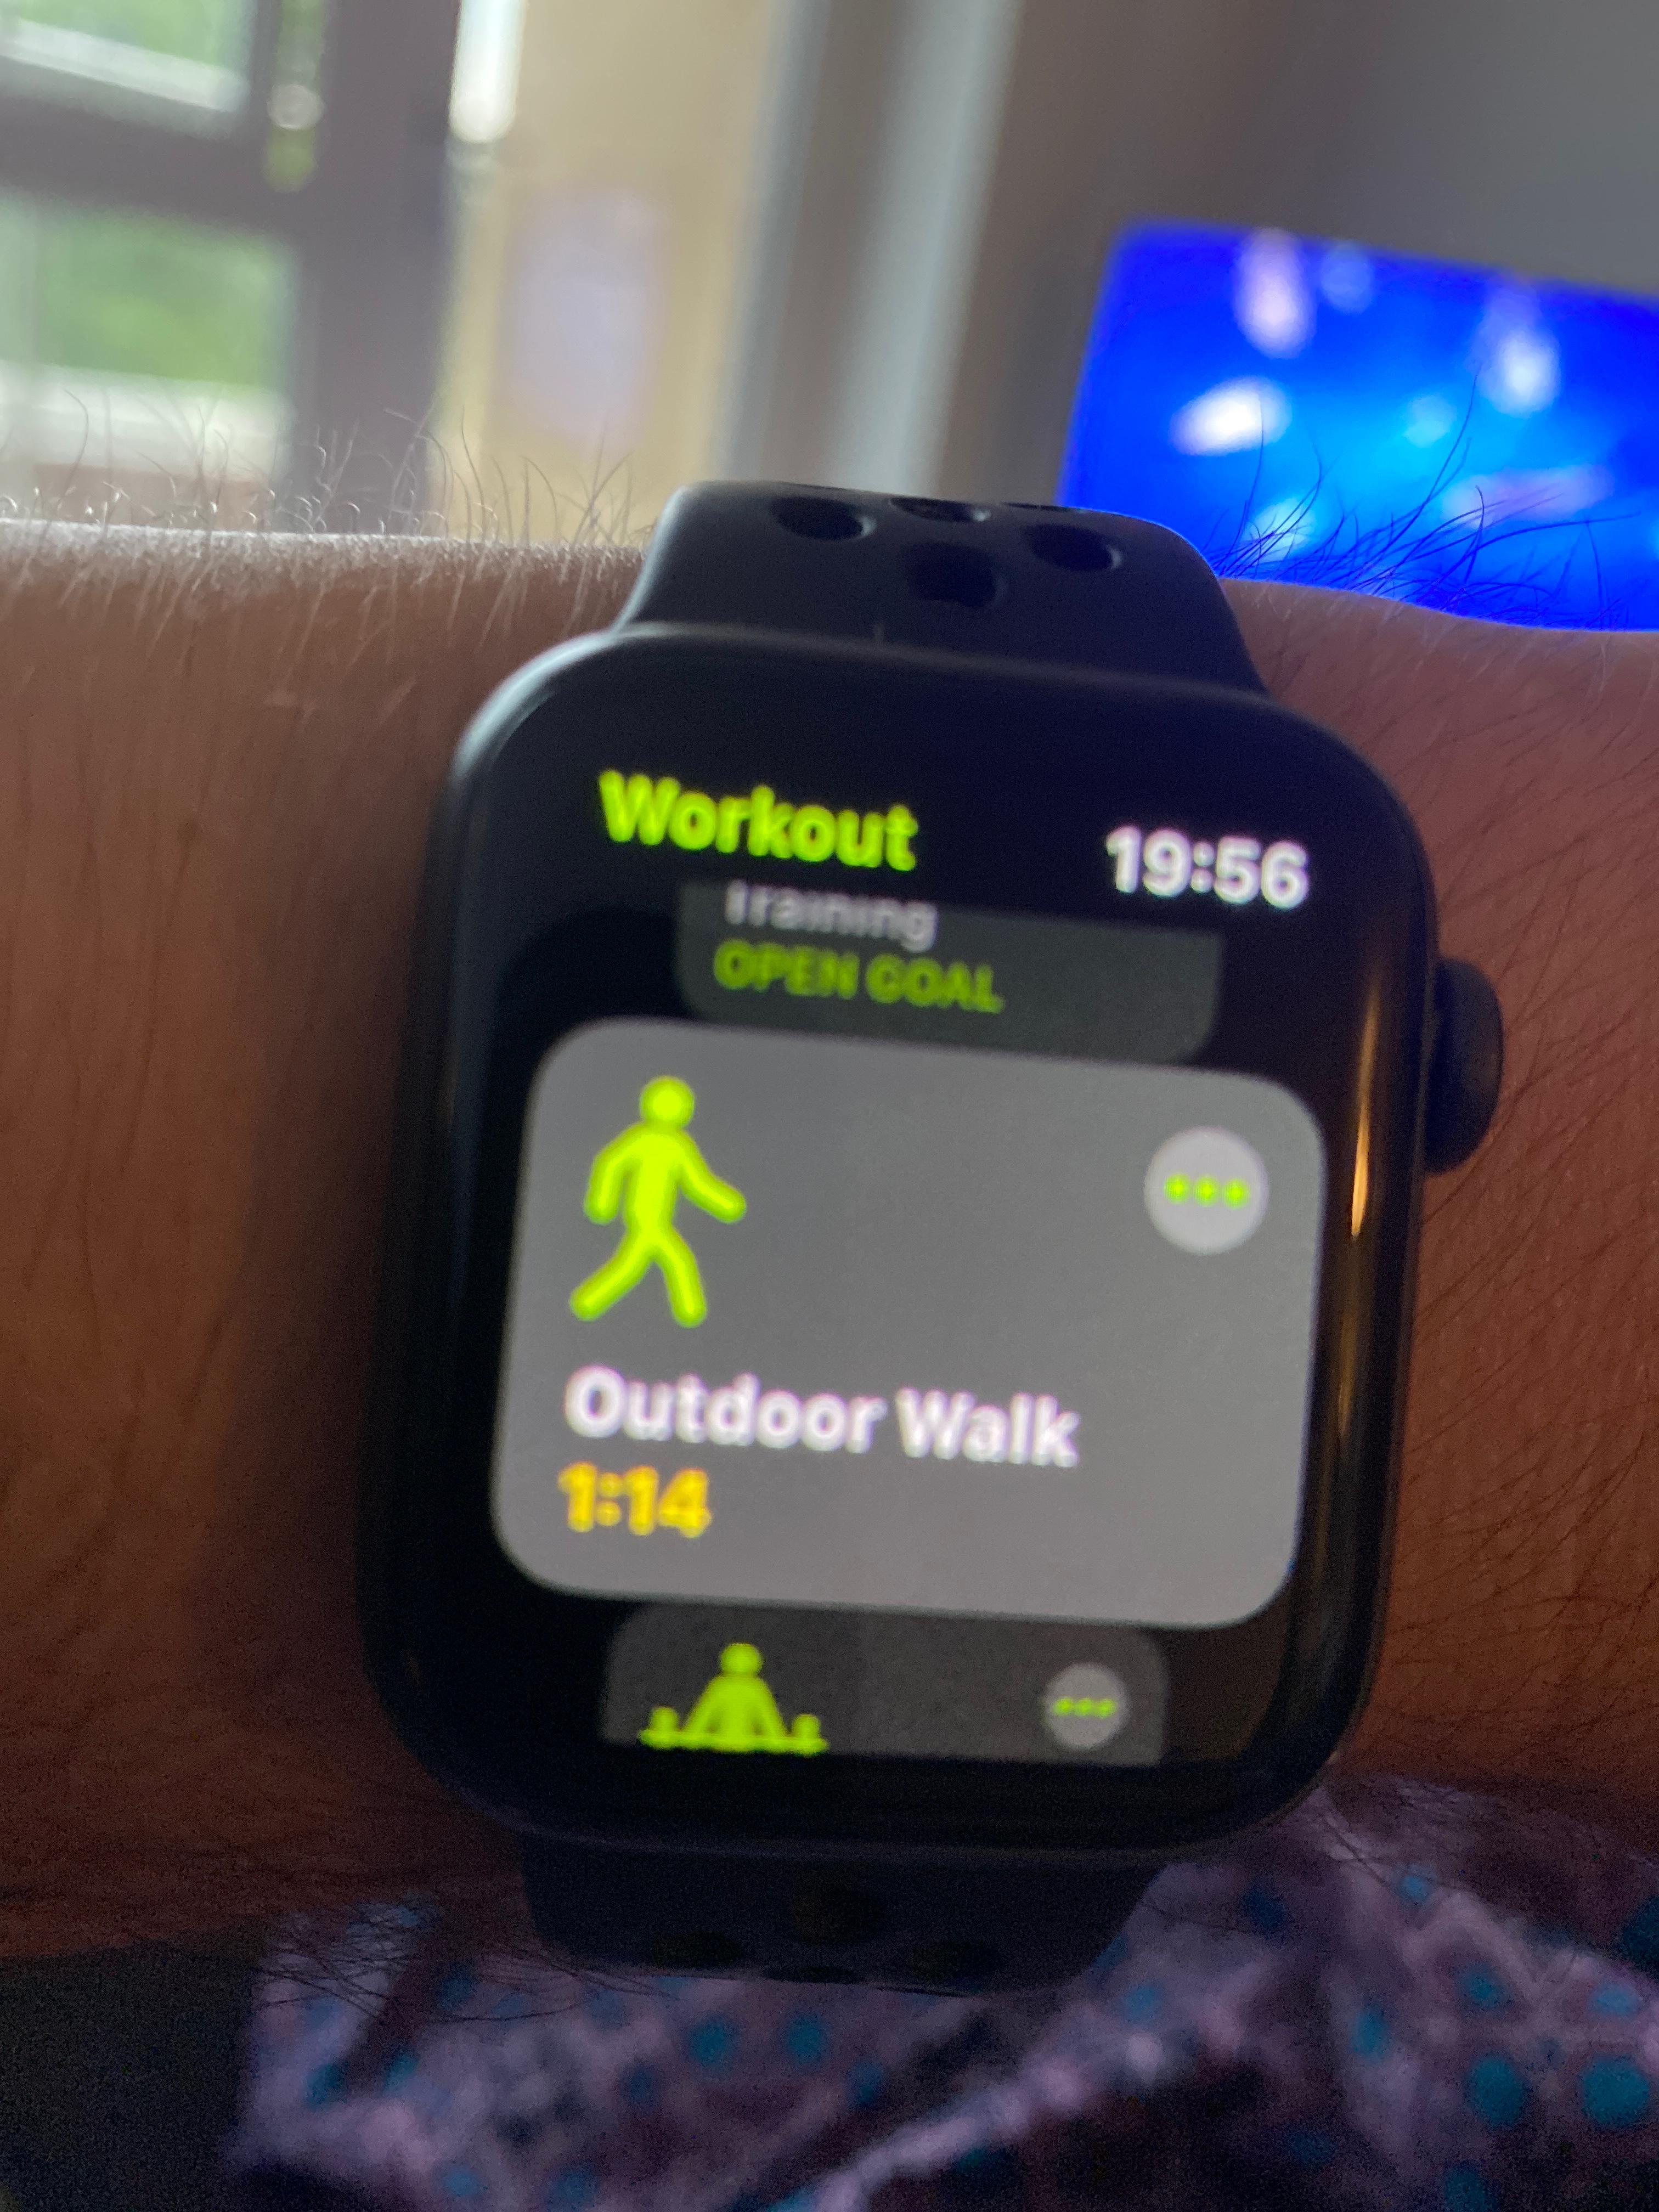 Removing Apple Watch Activity Goals Apple Community